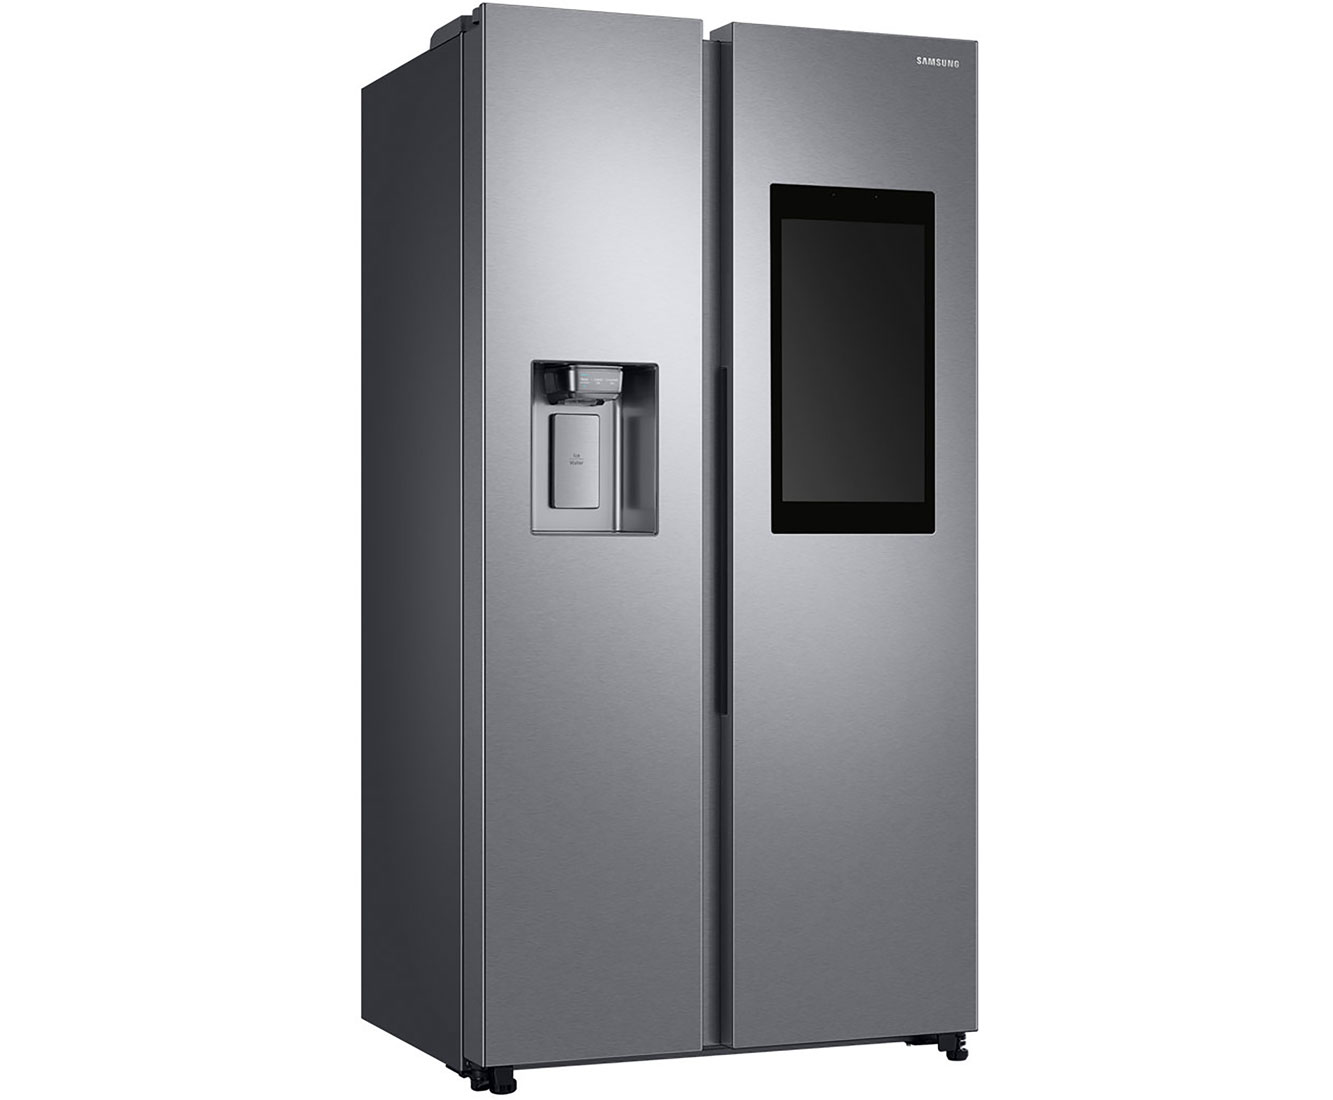 Amica Kühlschrank Side By Side : Side by side kühlschrank mit tv ifa smarter kühlschrank mit wlan